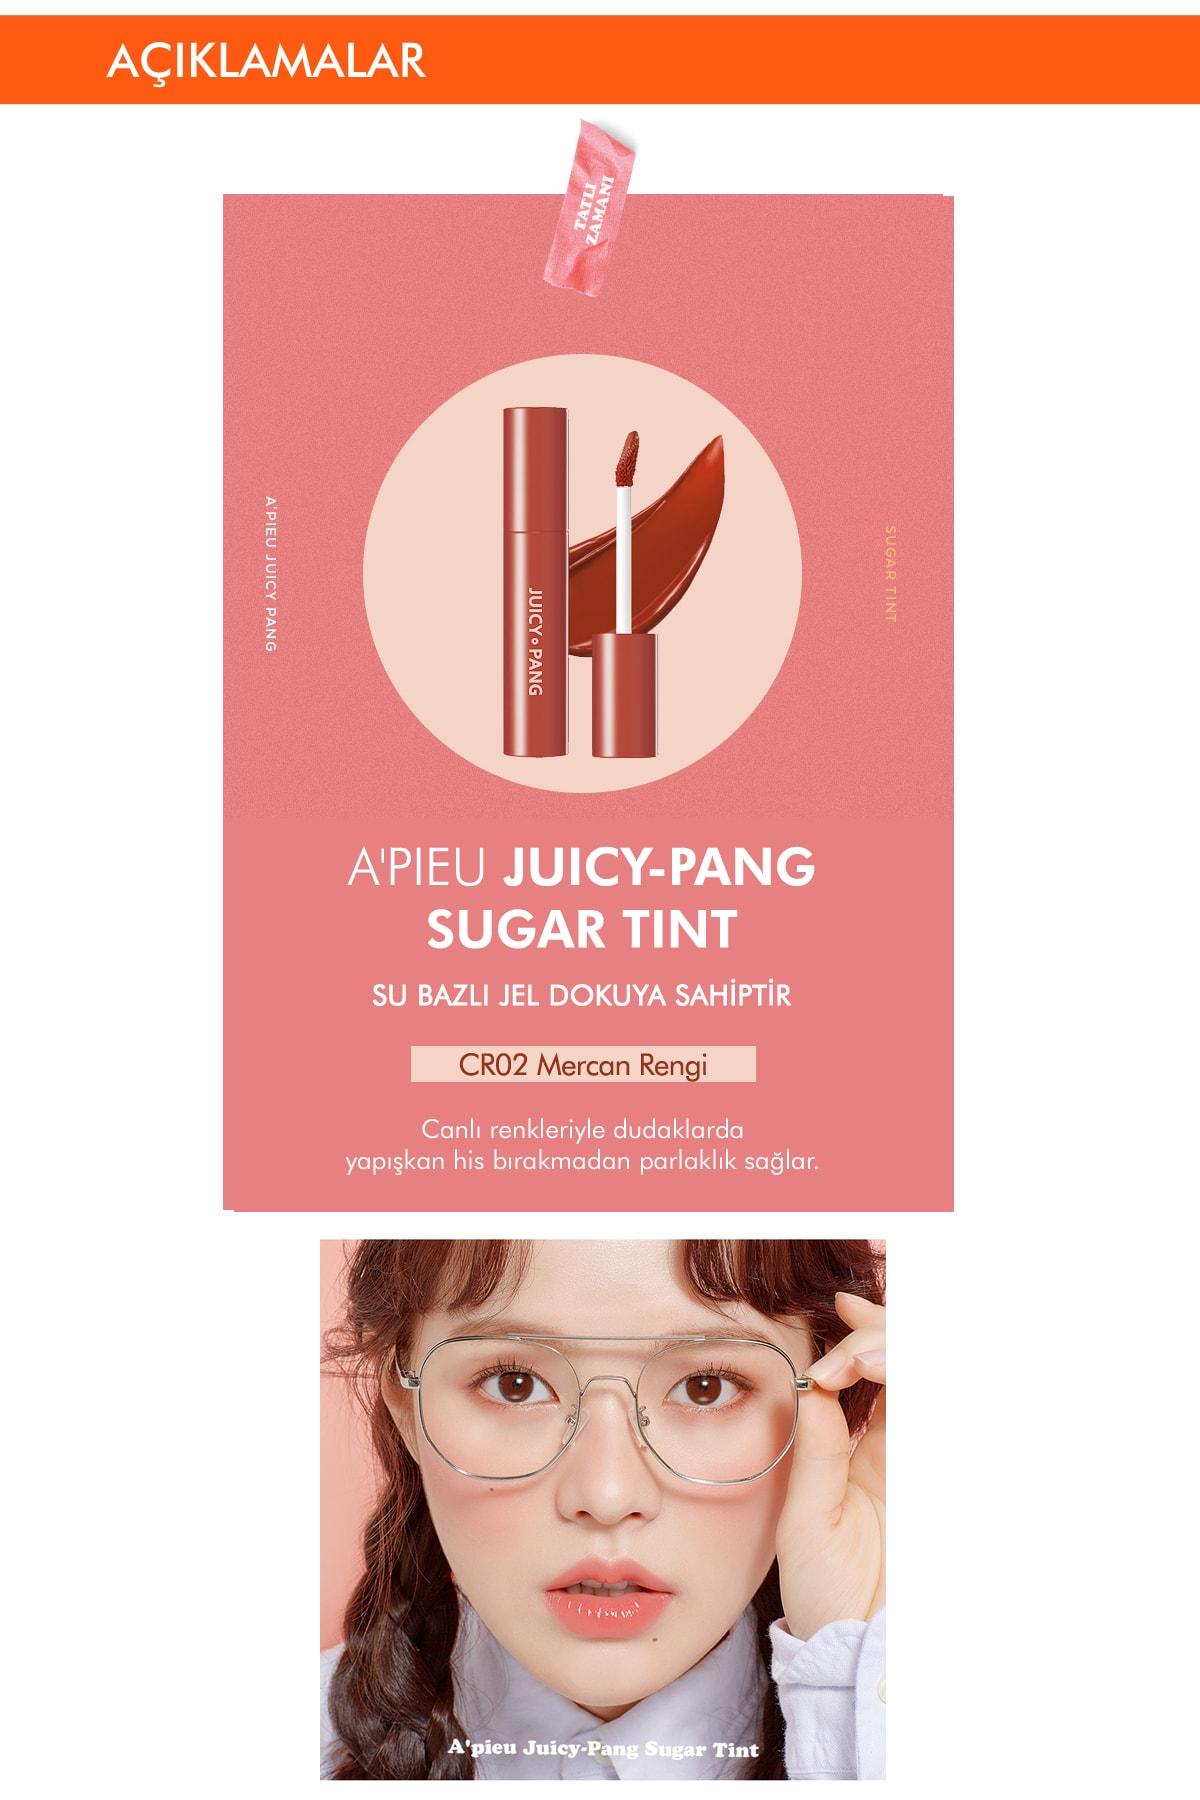 Missha Uzun Süre Kalıcı Parlak Su Bazlı Jel Tint APIEU Juicy-Pang Sugar Tint (CR02) 2